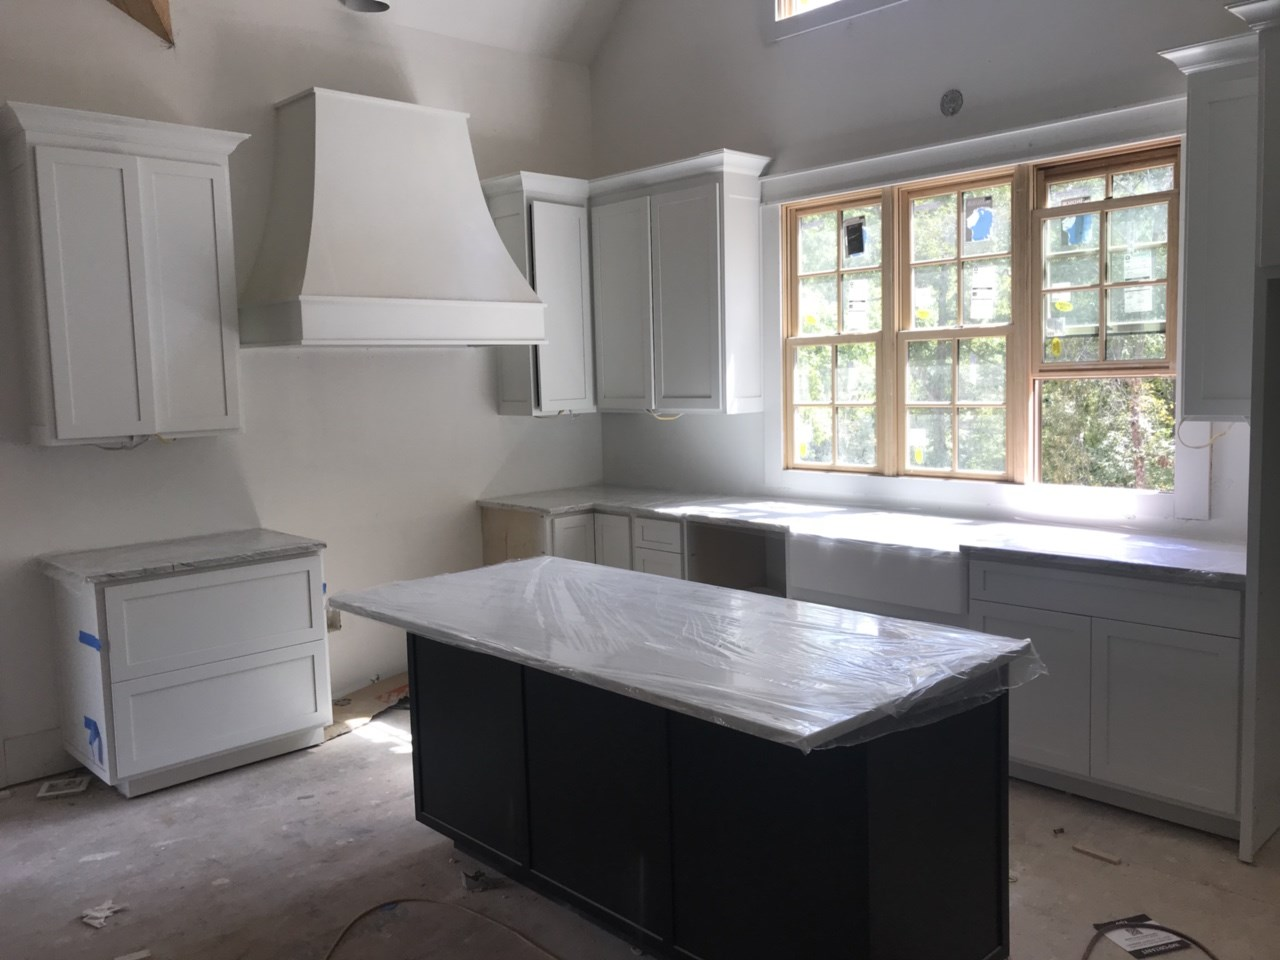 2-kitchen cabinets and granite